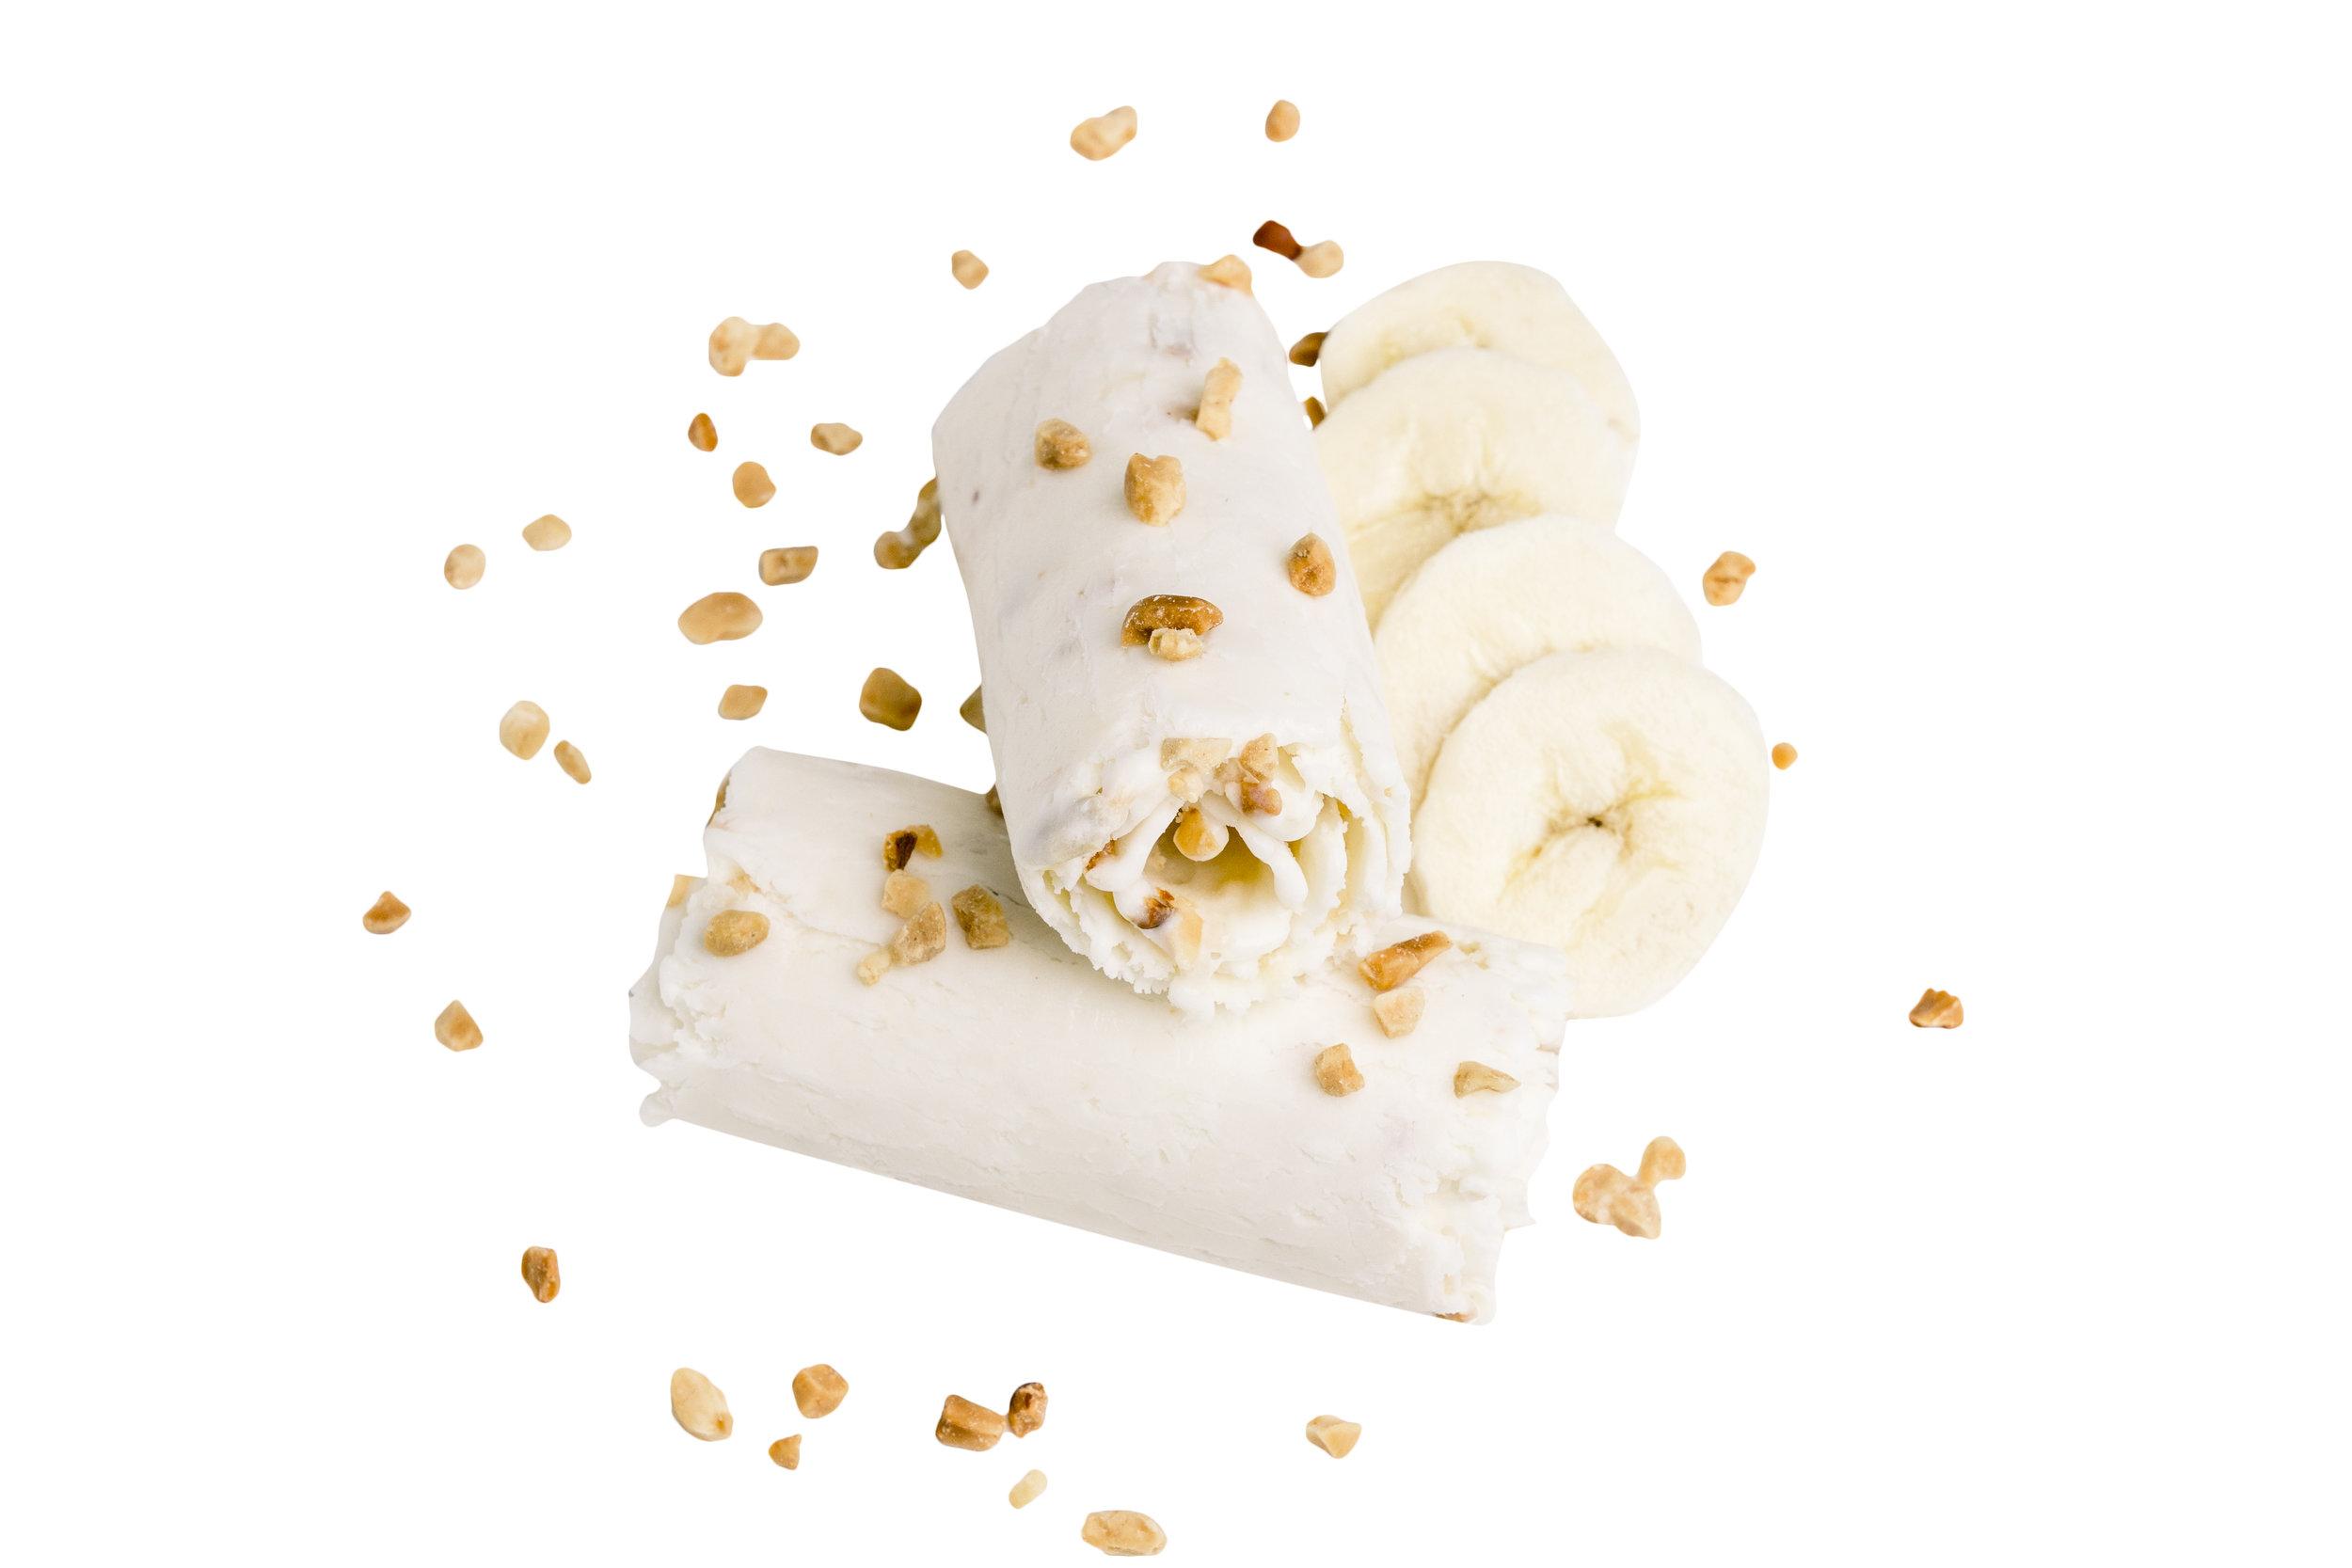 Banana & Nuts